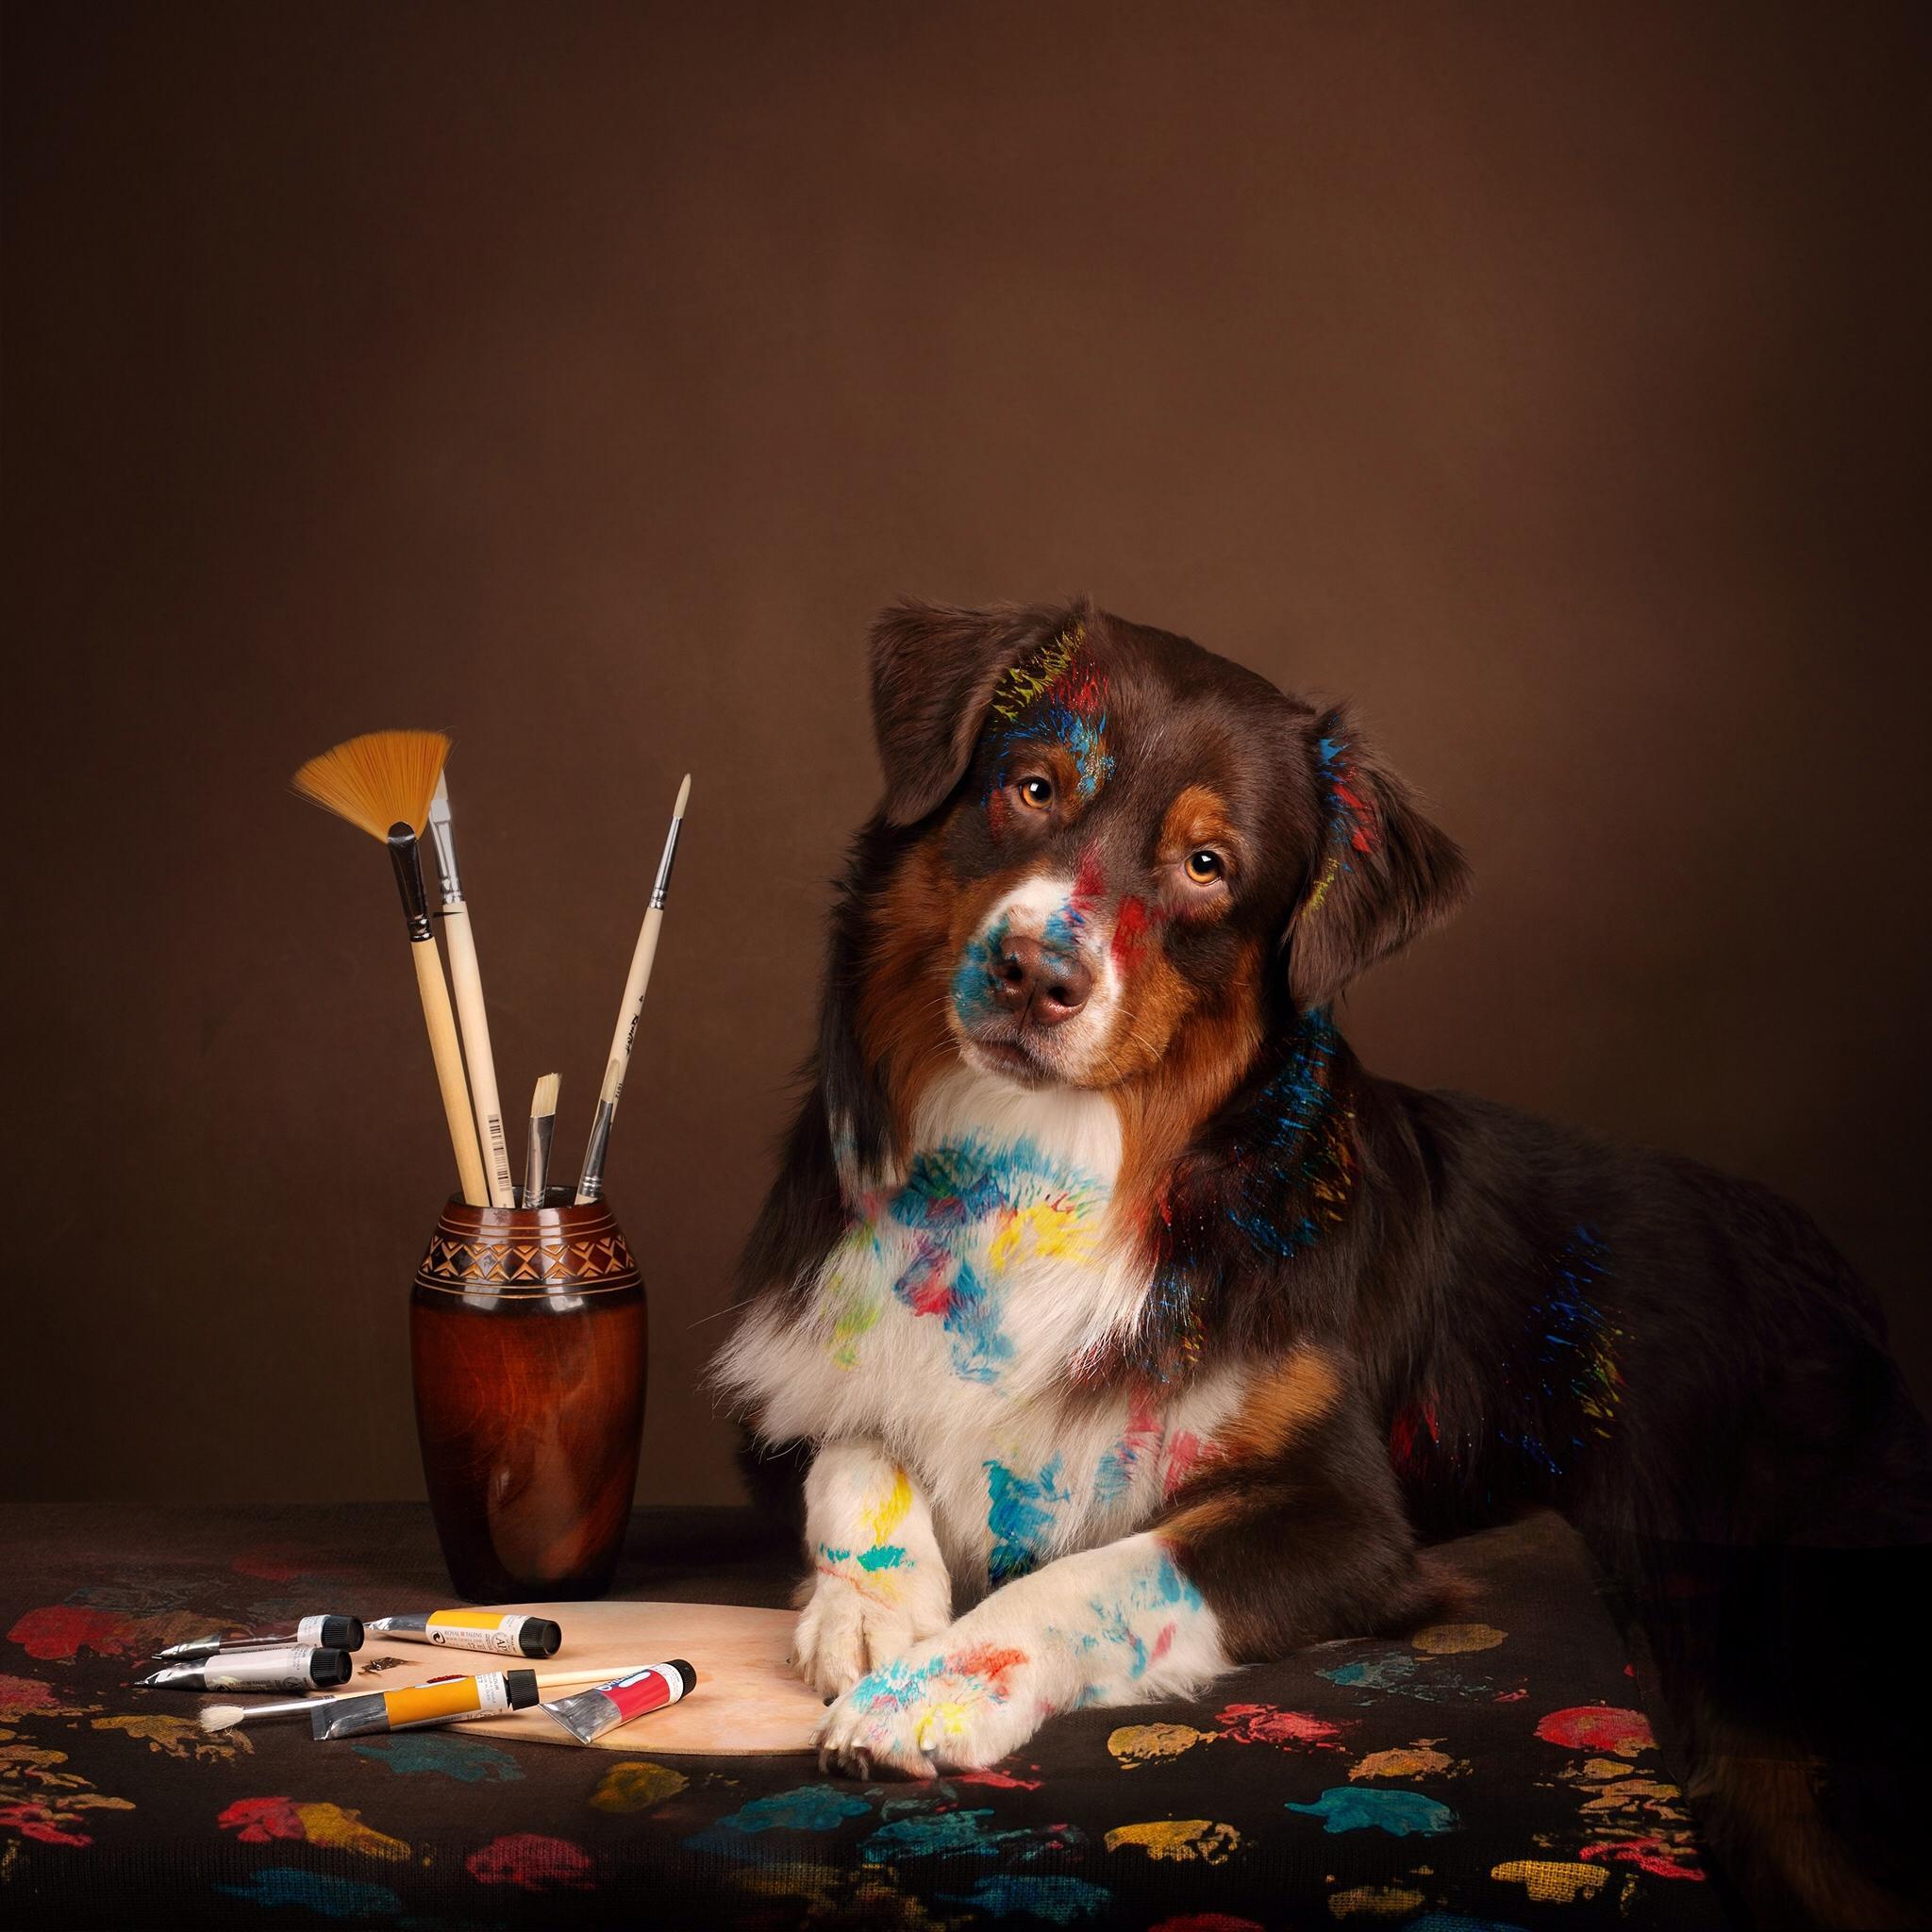 обои кисти, краски, собака, животное картинки фото